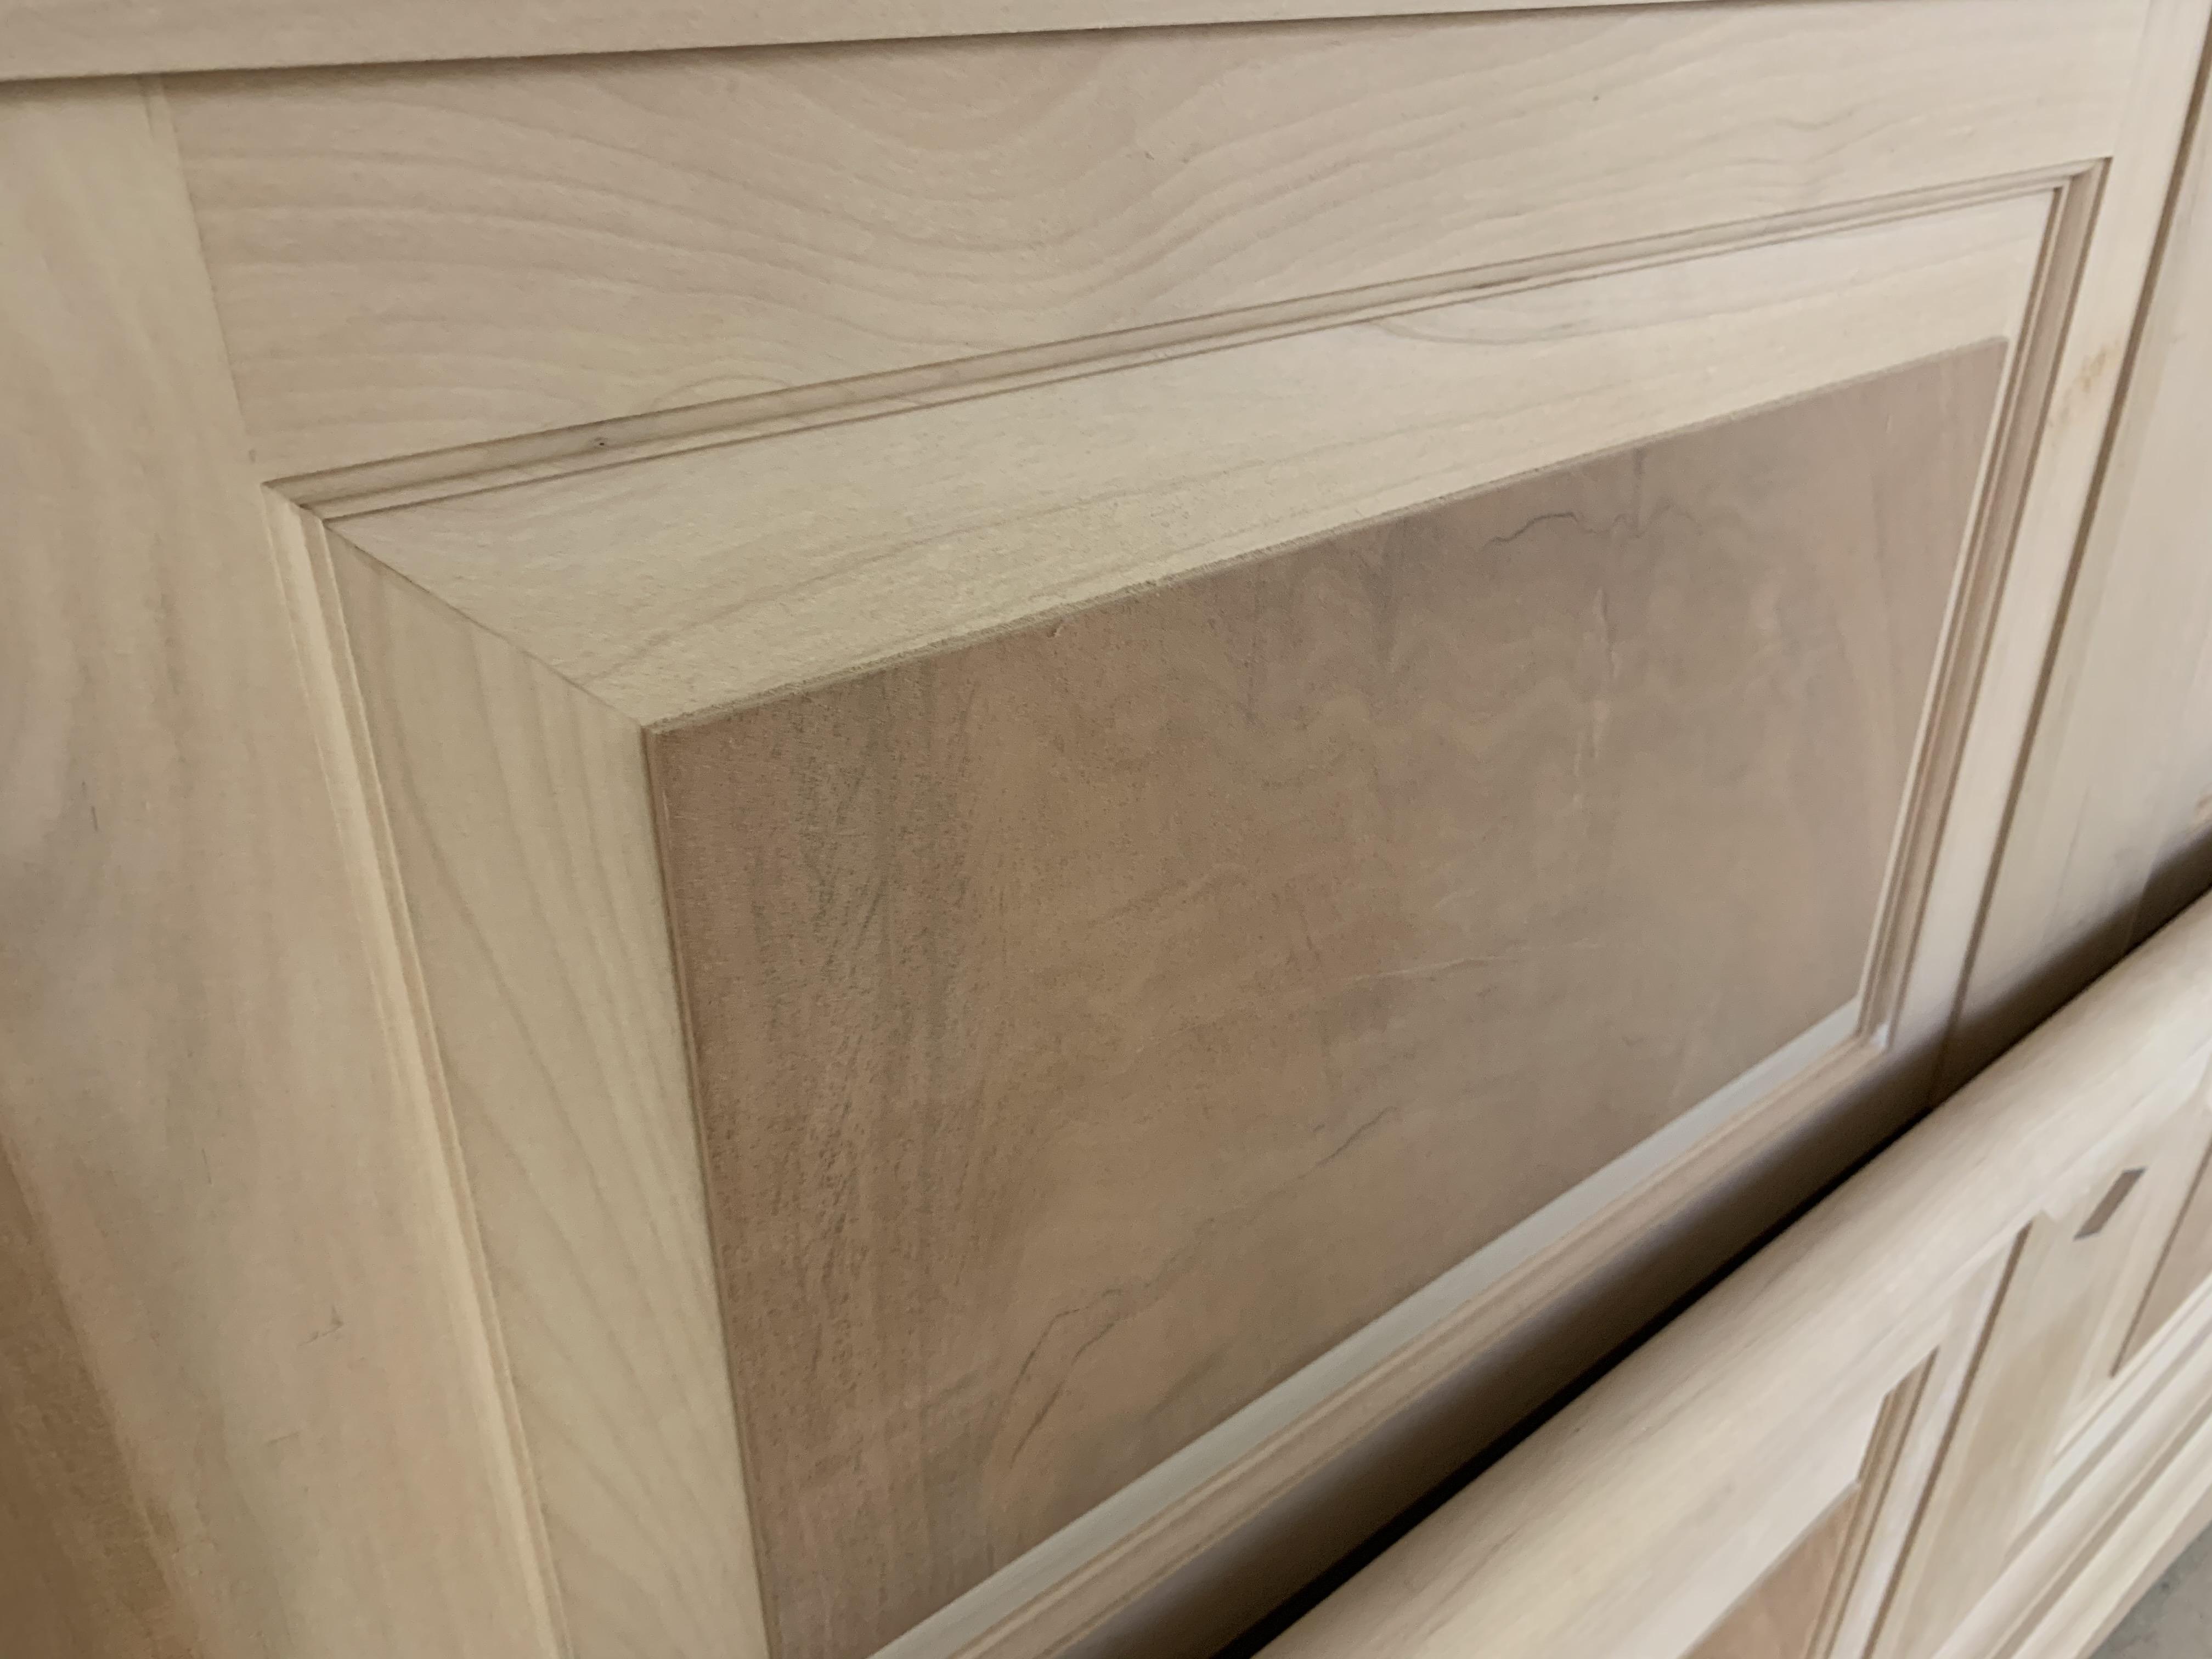 Lot 8 - 5' Cherry Finish Bed, from the Trafalgar range, RRP £4758 (requires finishing/polishing). Model no